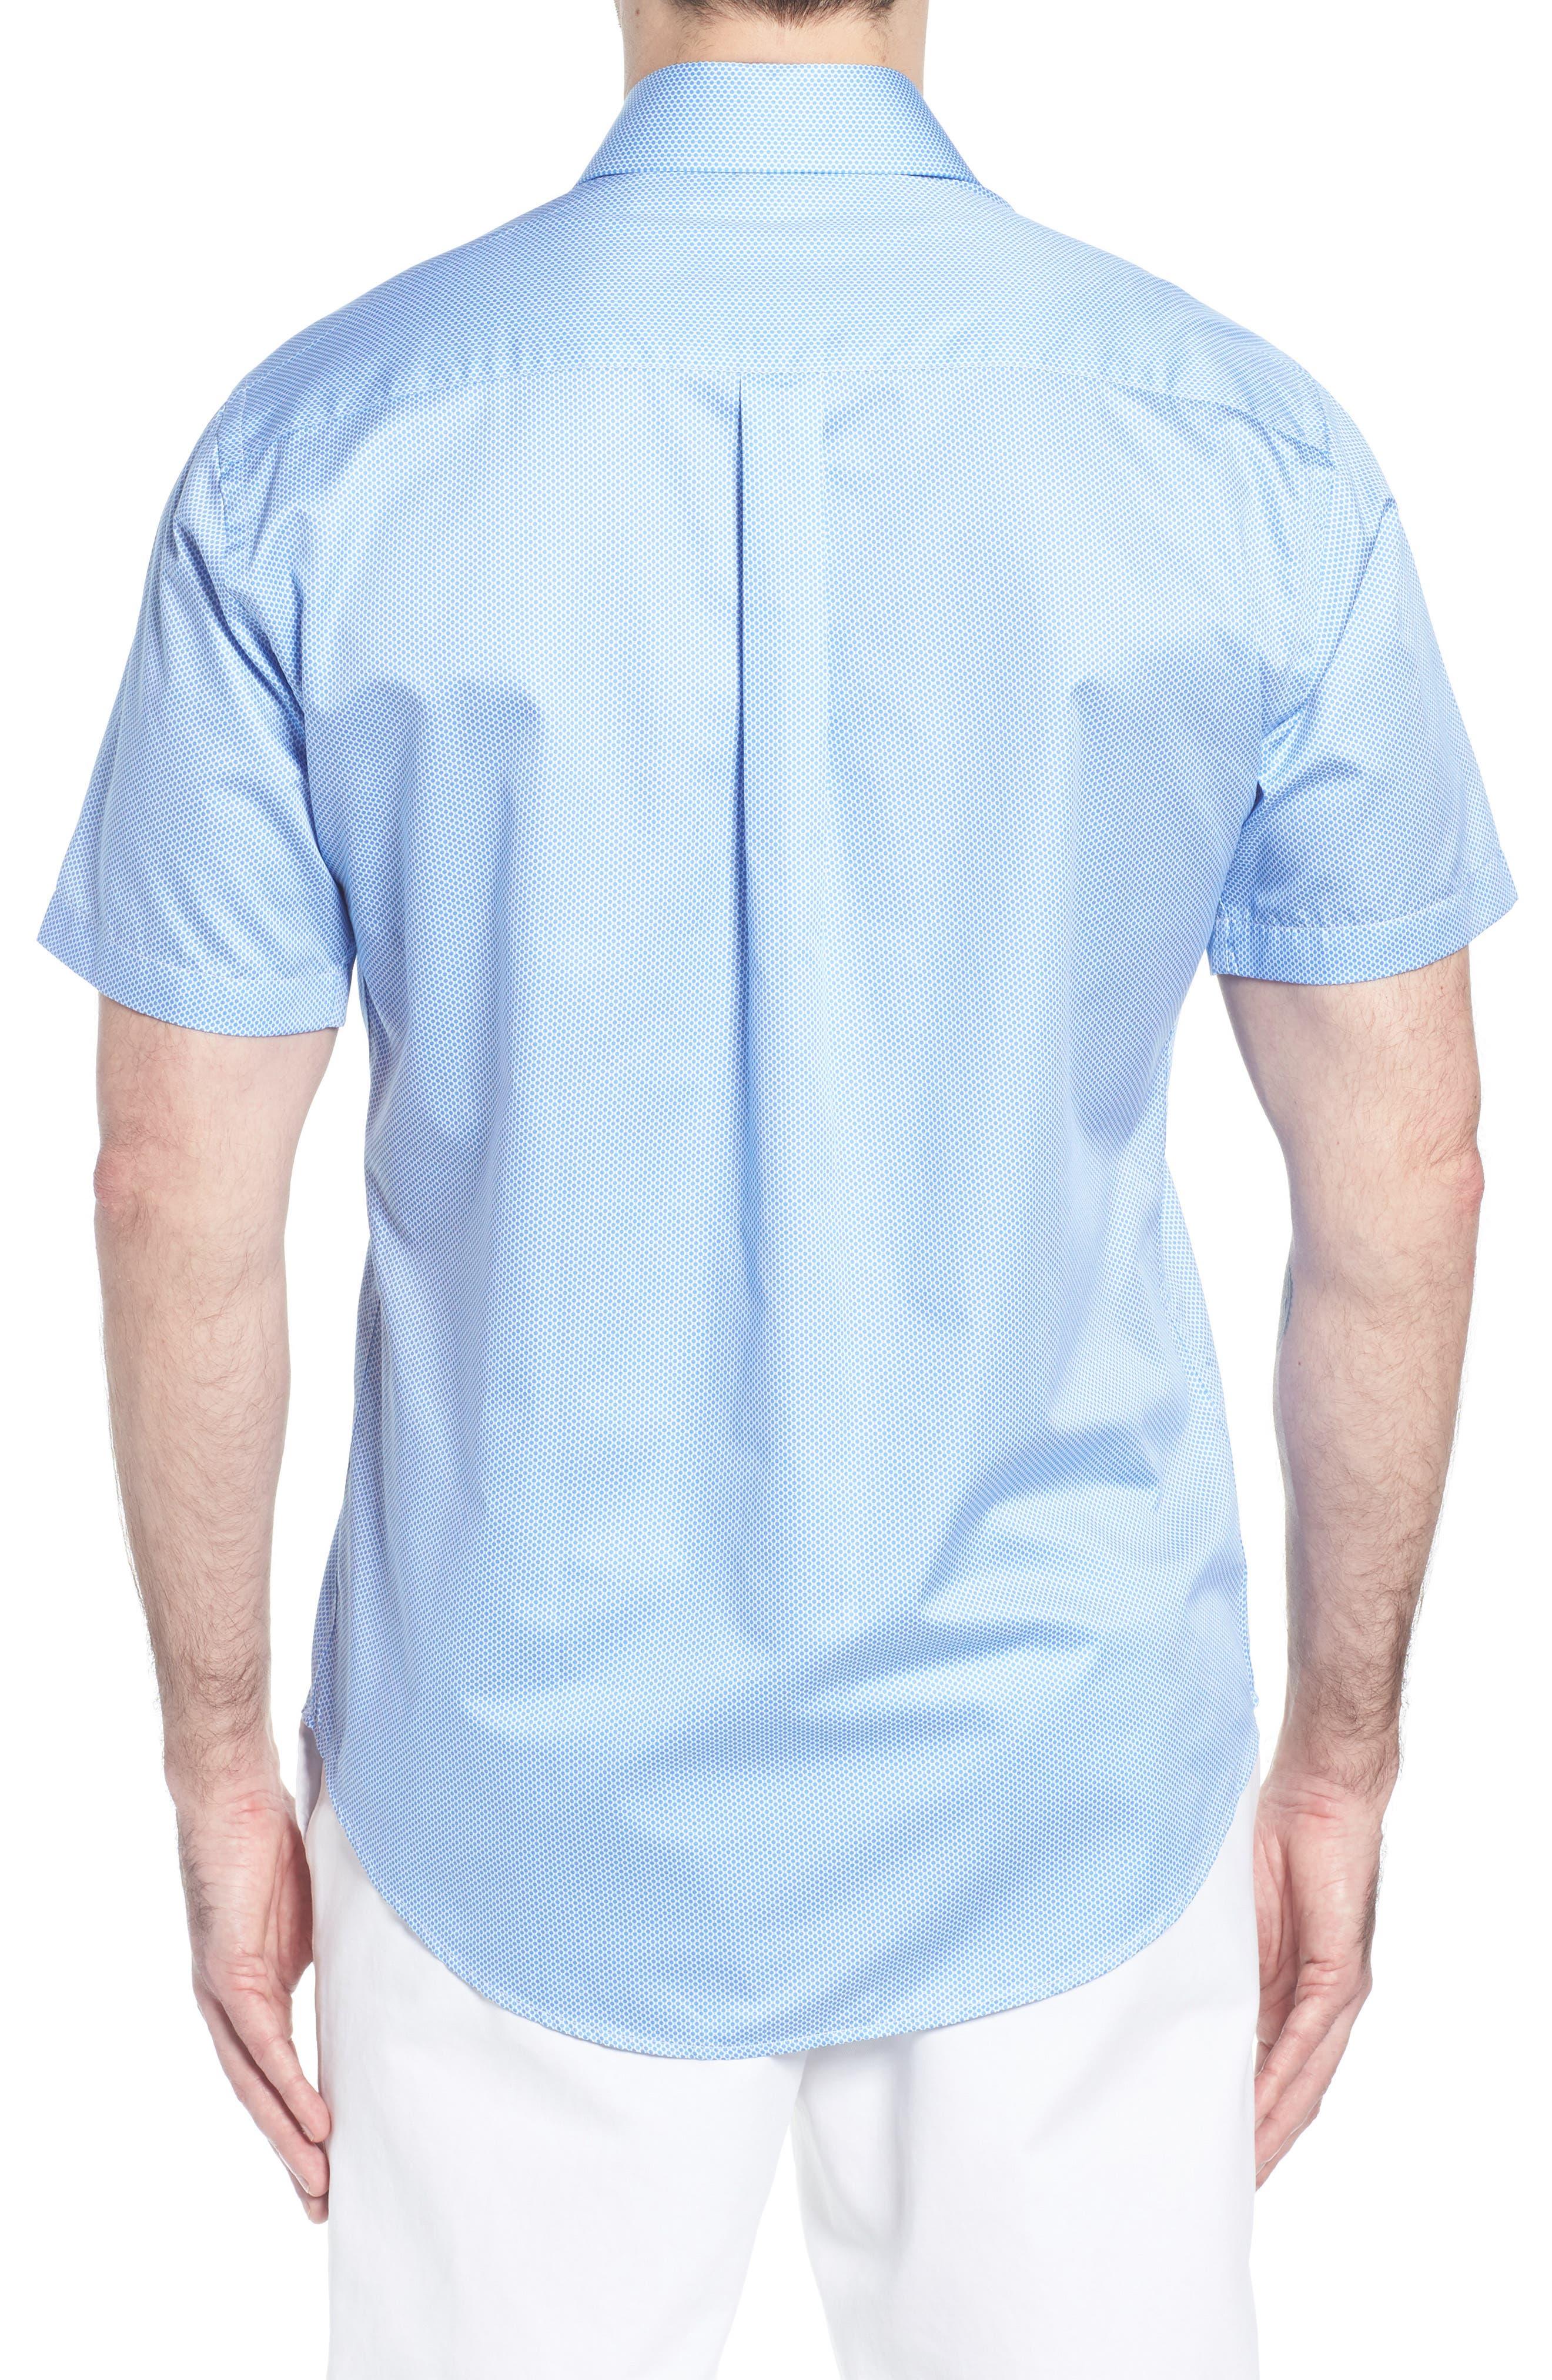 Crown Ease Connecting the Dots Sport Shirt,                             Alternate thumbnail 3, color,                             Atlas Blue